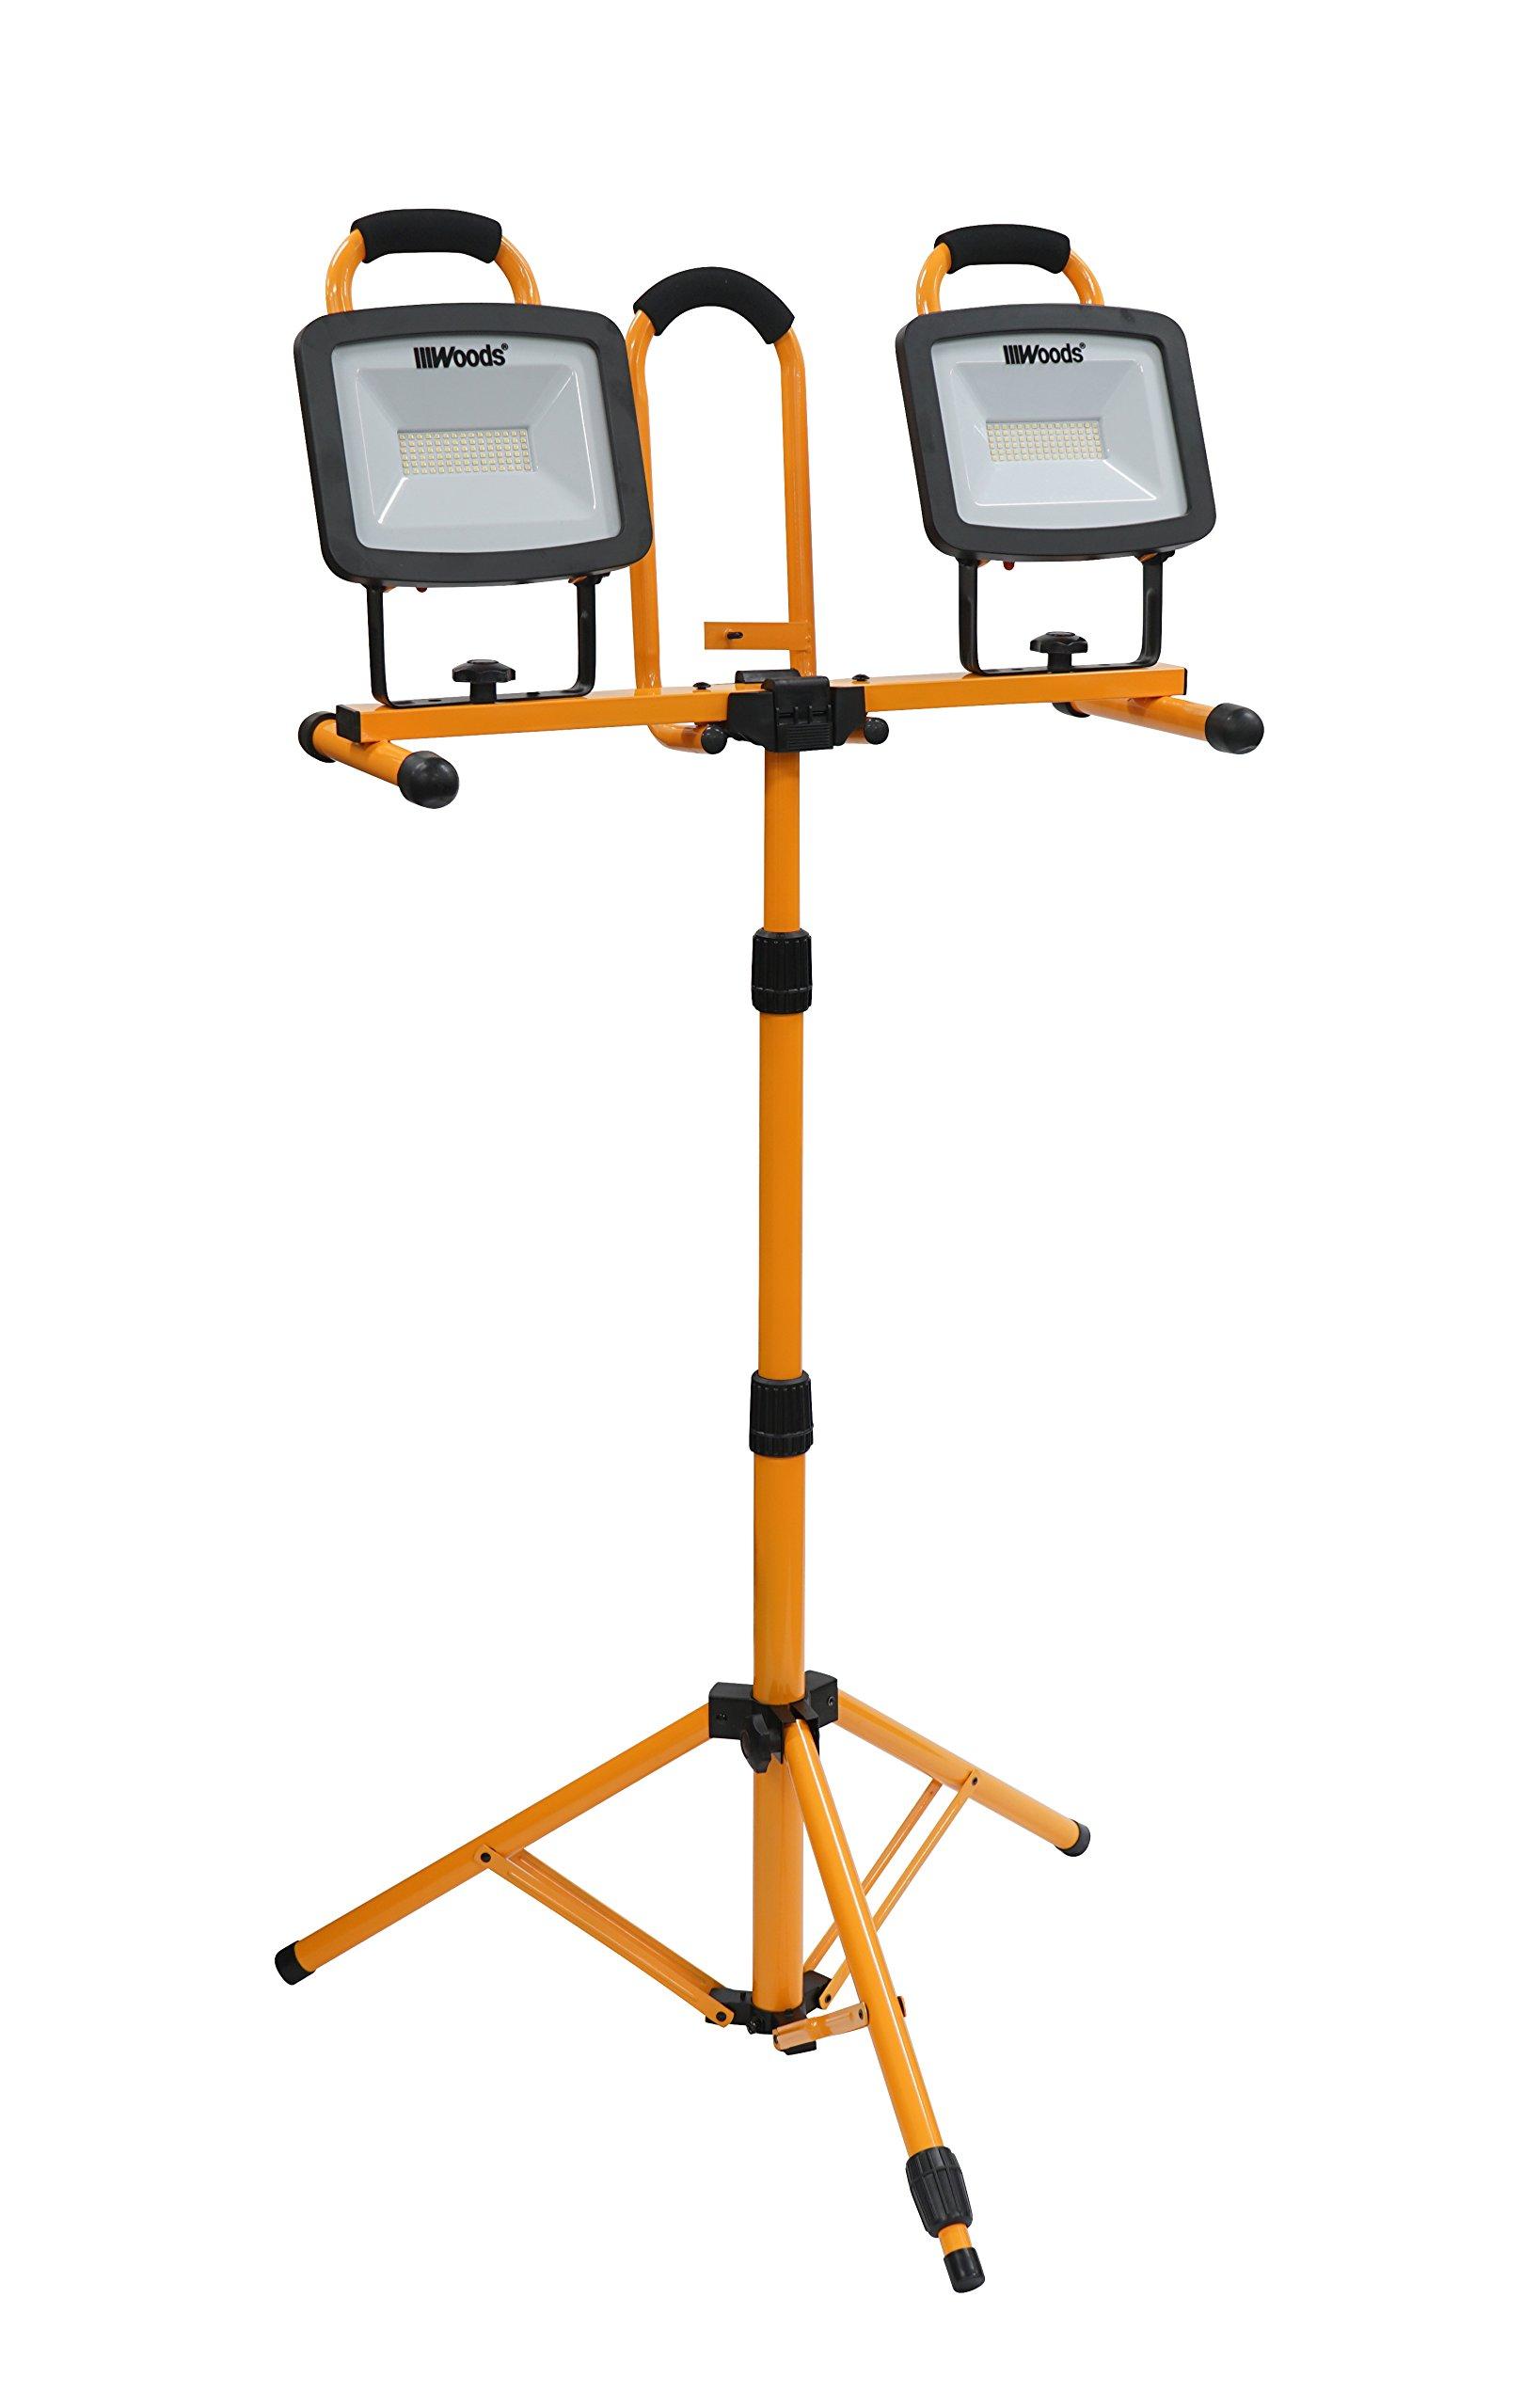 Woods WL40272S Portable LED Duel Work Light On Steel Tripod, 12000 Lumens, 140 Watts, 4000 Kelvin, 5 Foot Cord, Orange/Black by Woods